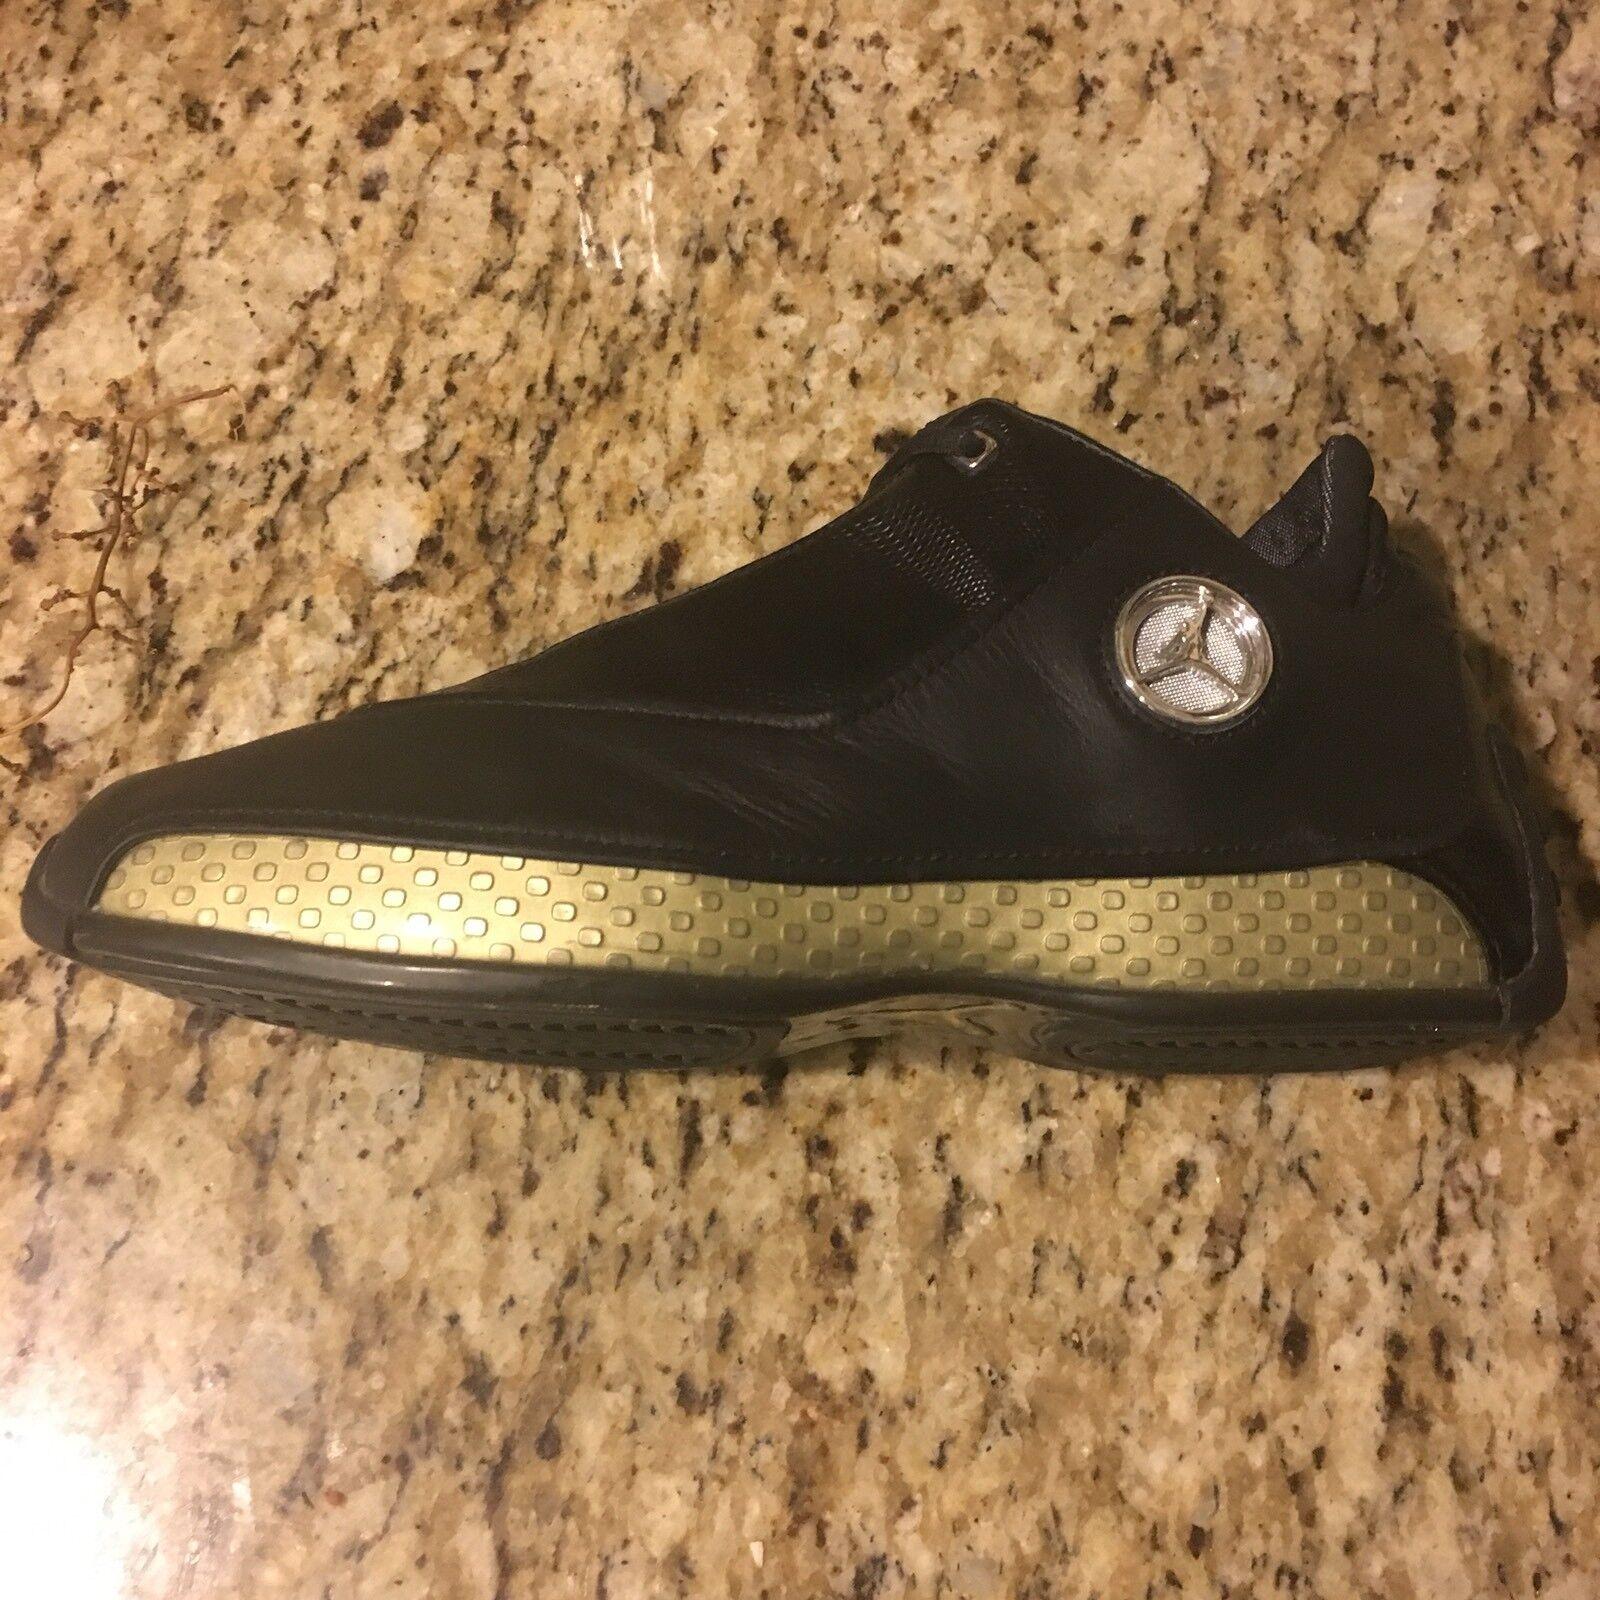 Nike Retro Jordan XVIII 18 Black Leather Basketball Sneakers Comfortable Comfortable and good-looking